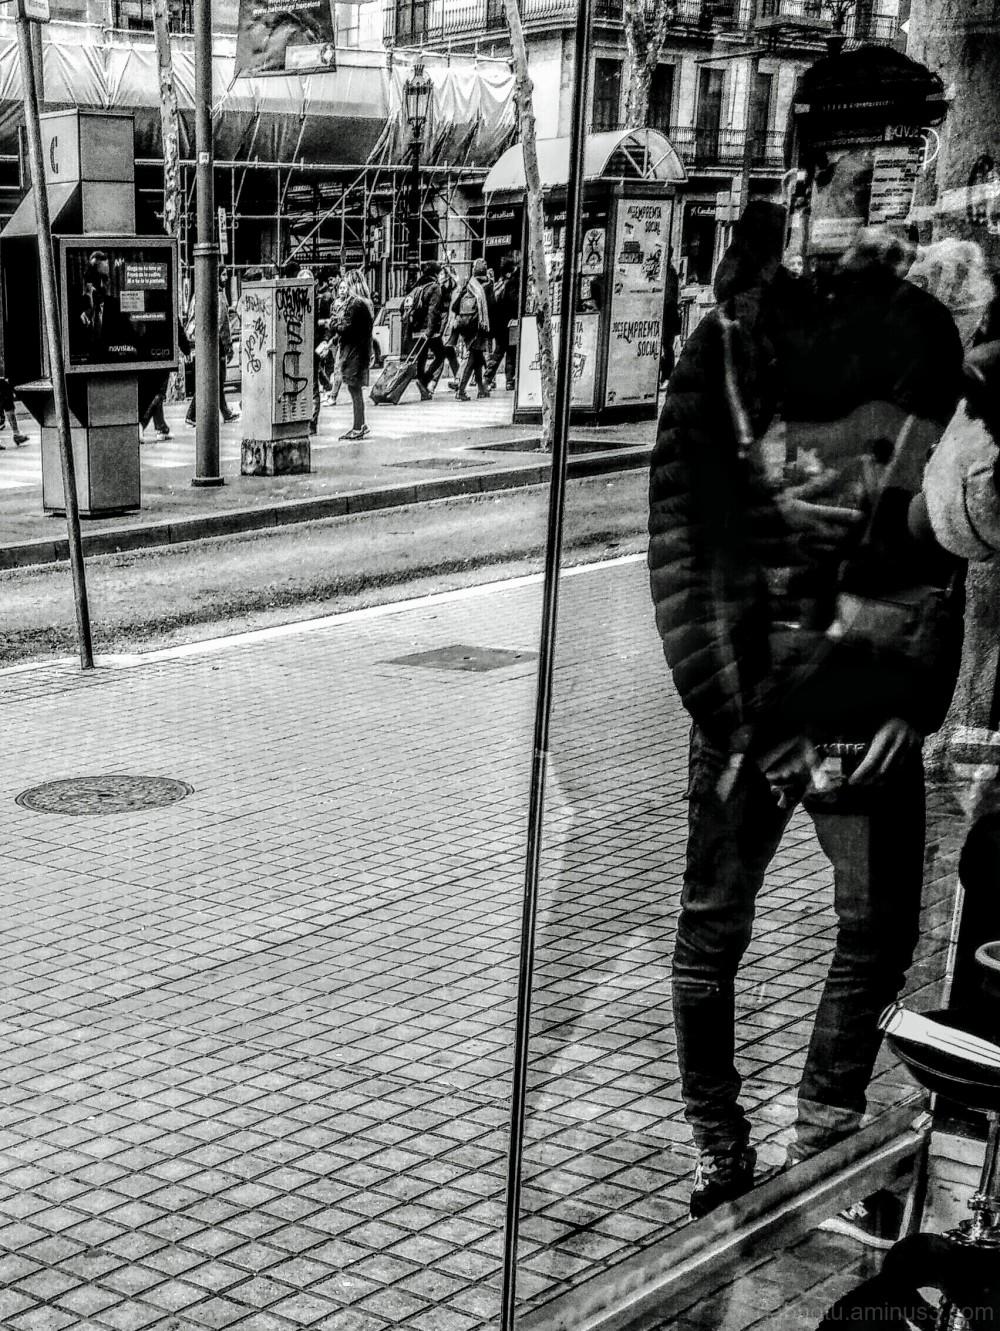 Black and white/grayscale/monochrome street photo!